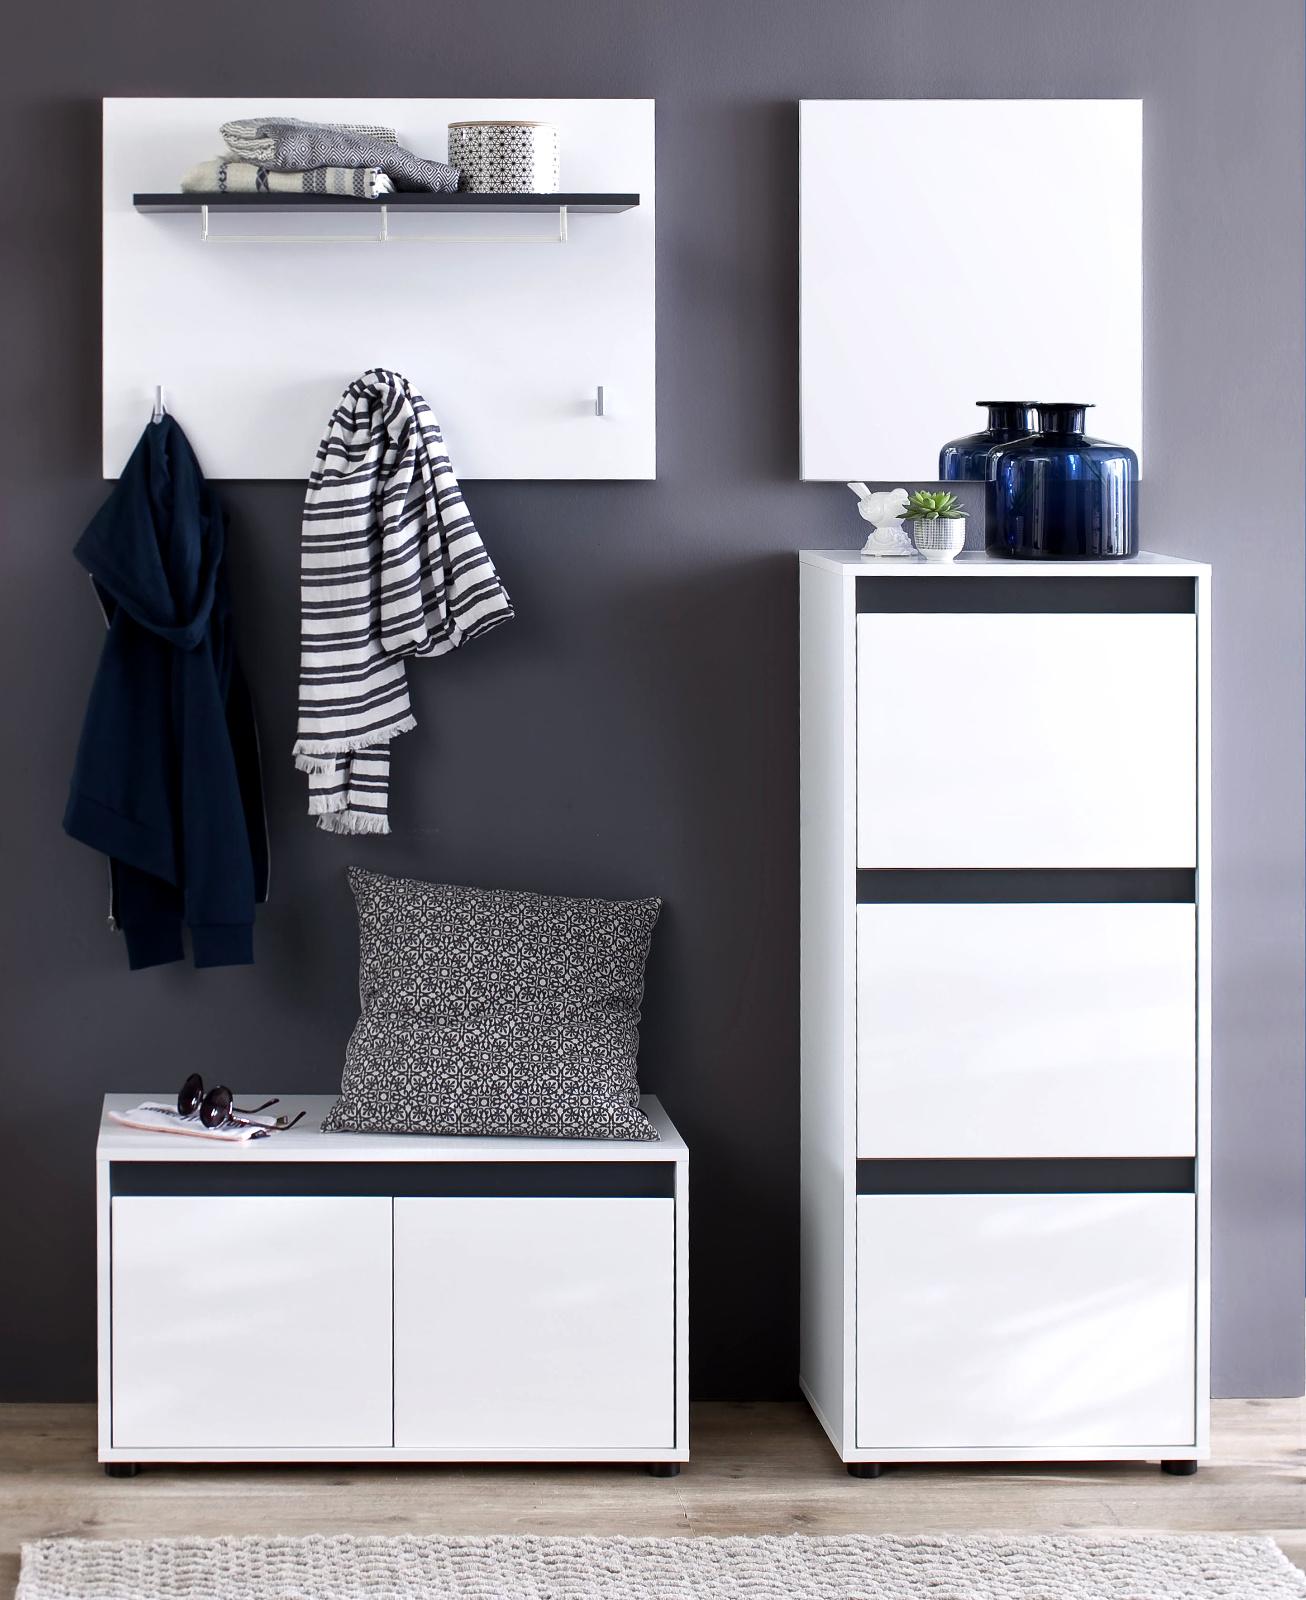 flurgarderobe sol lack hochglanz wei und grau 4 teilig. Black Bedroom Furniture Sets. Home Design Ideas